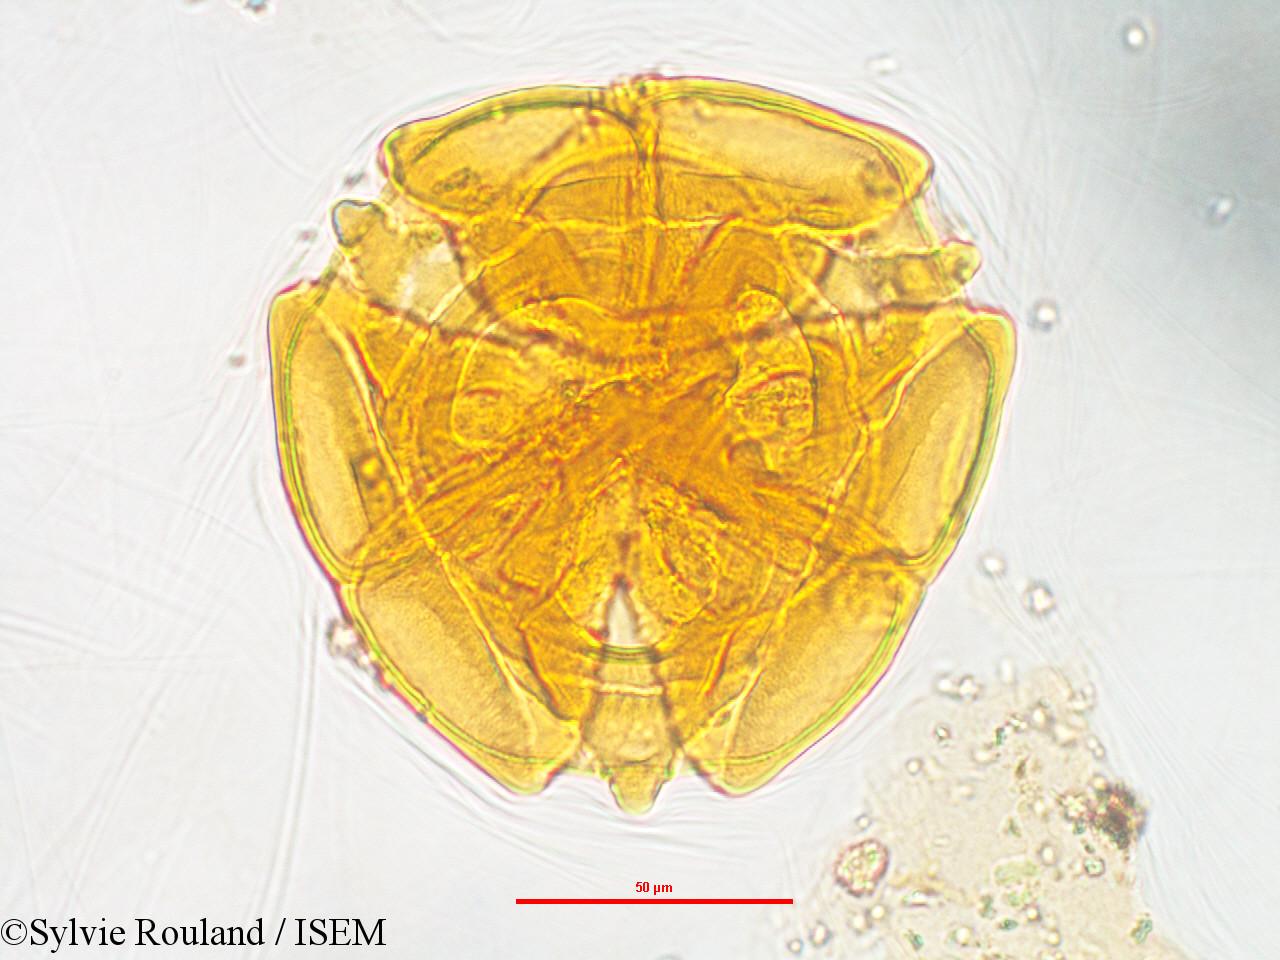 Sylvie.Rouland/Sarcolaena_multiflora_3245/Sarcolaena_multiflora_3245_0007(copy).jpg